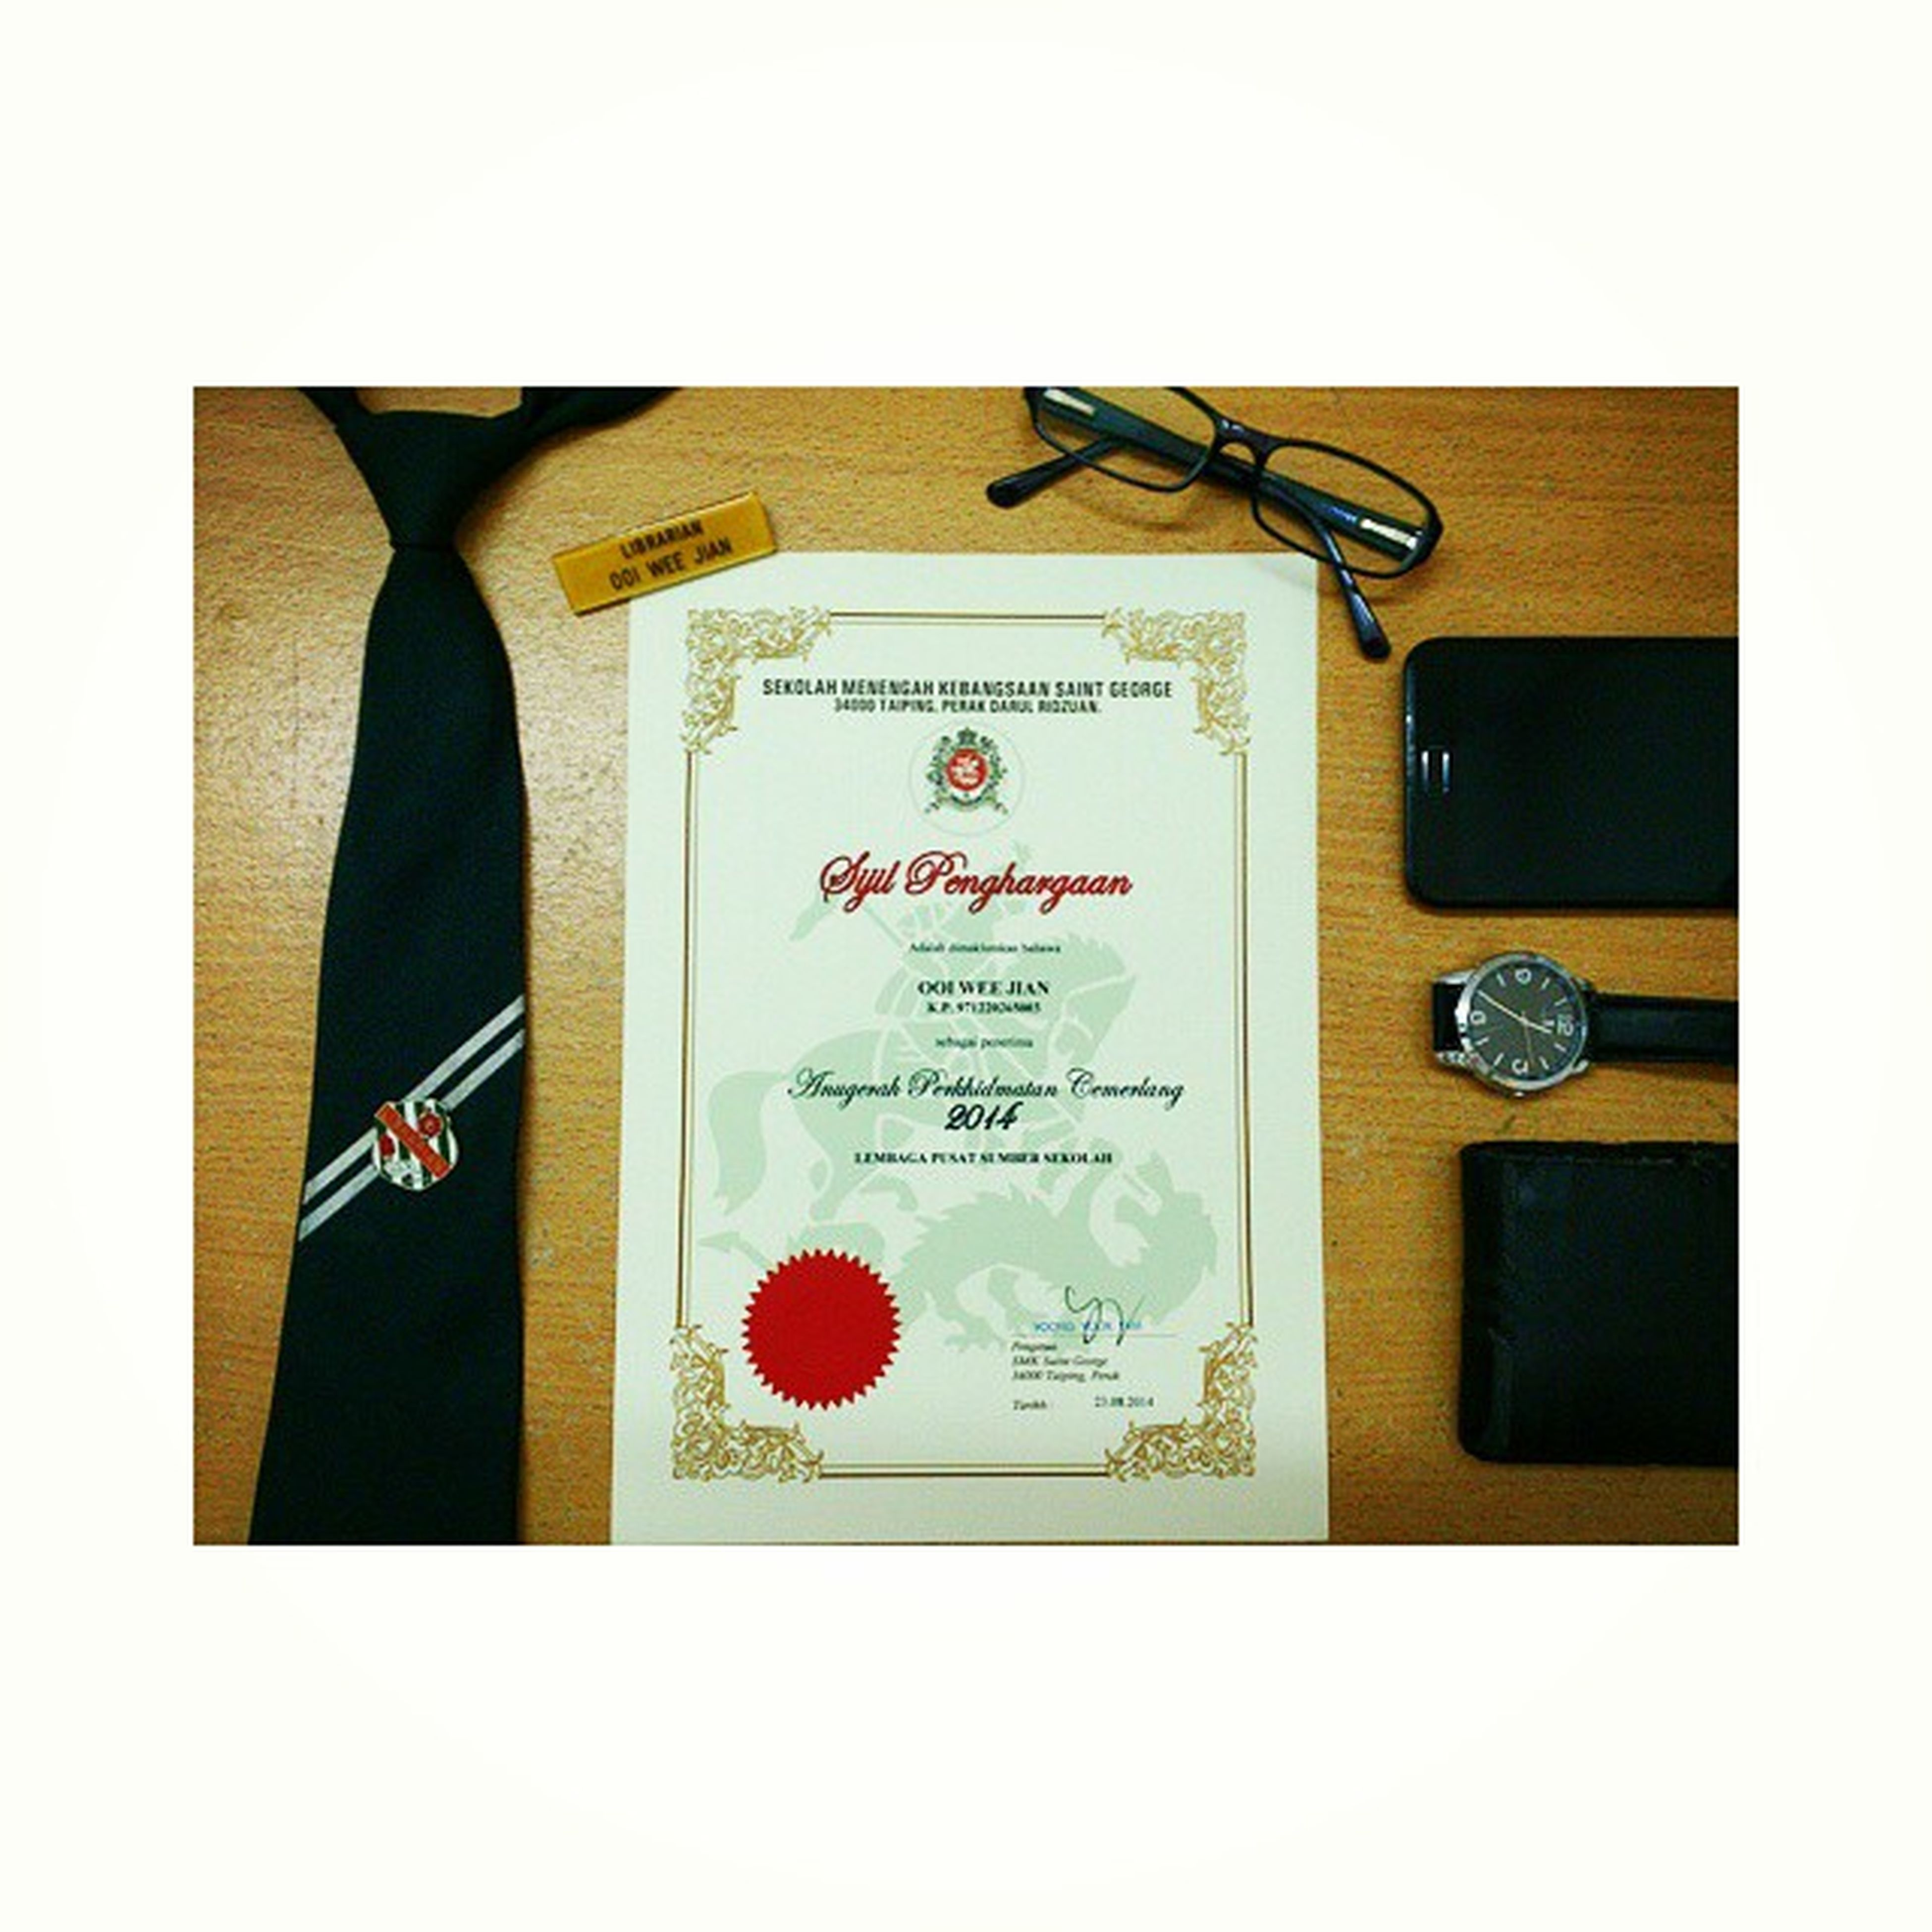 Time passes so fast. I've been working as Librarian for five years and finally received a 'Sijil Penghargaan' 😊 HariKokurikulum AnugerahPerkhidmatanCemerlang